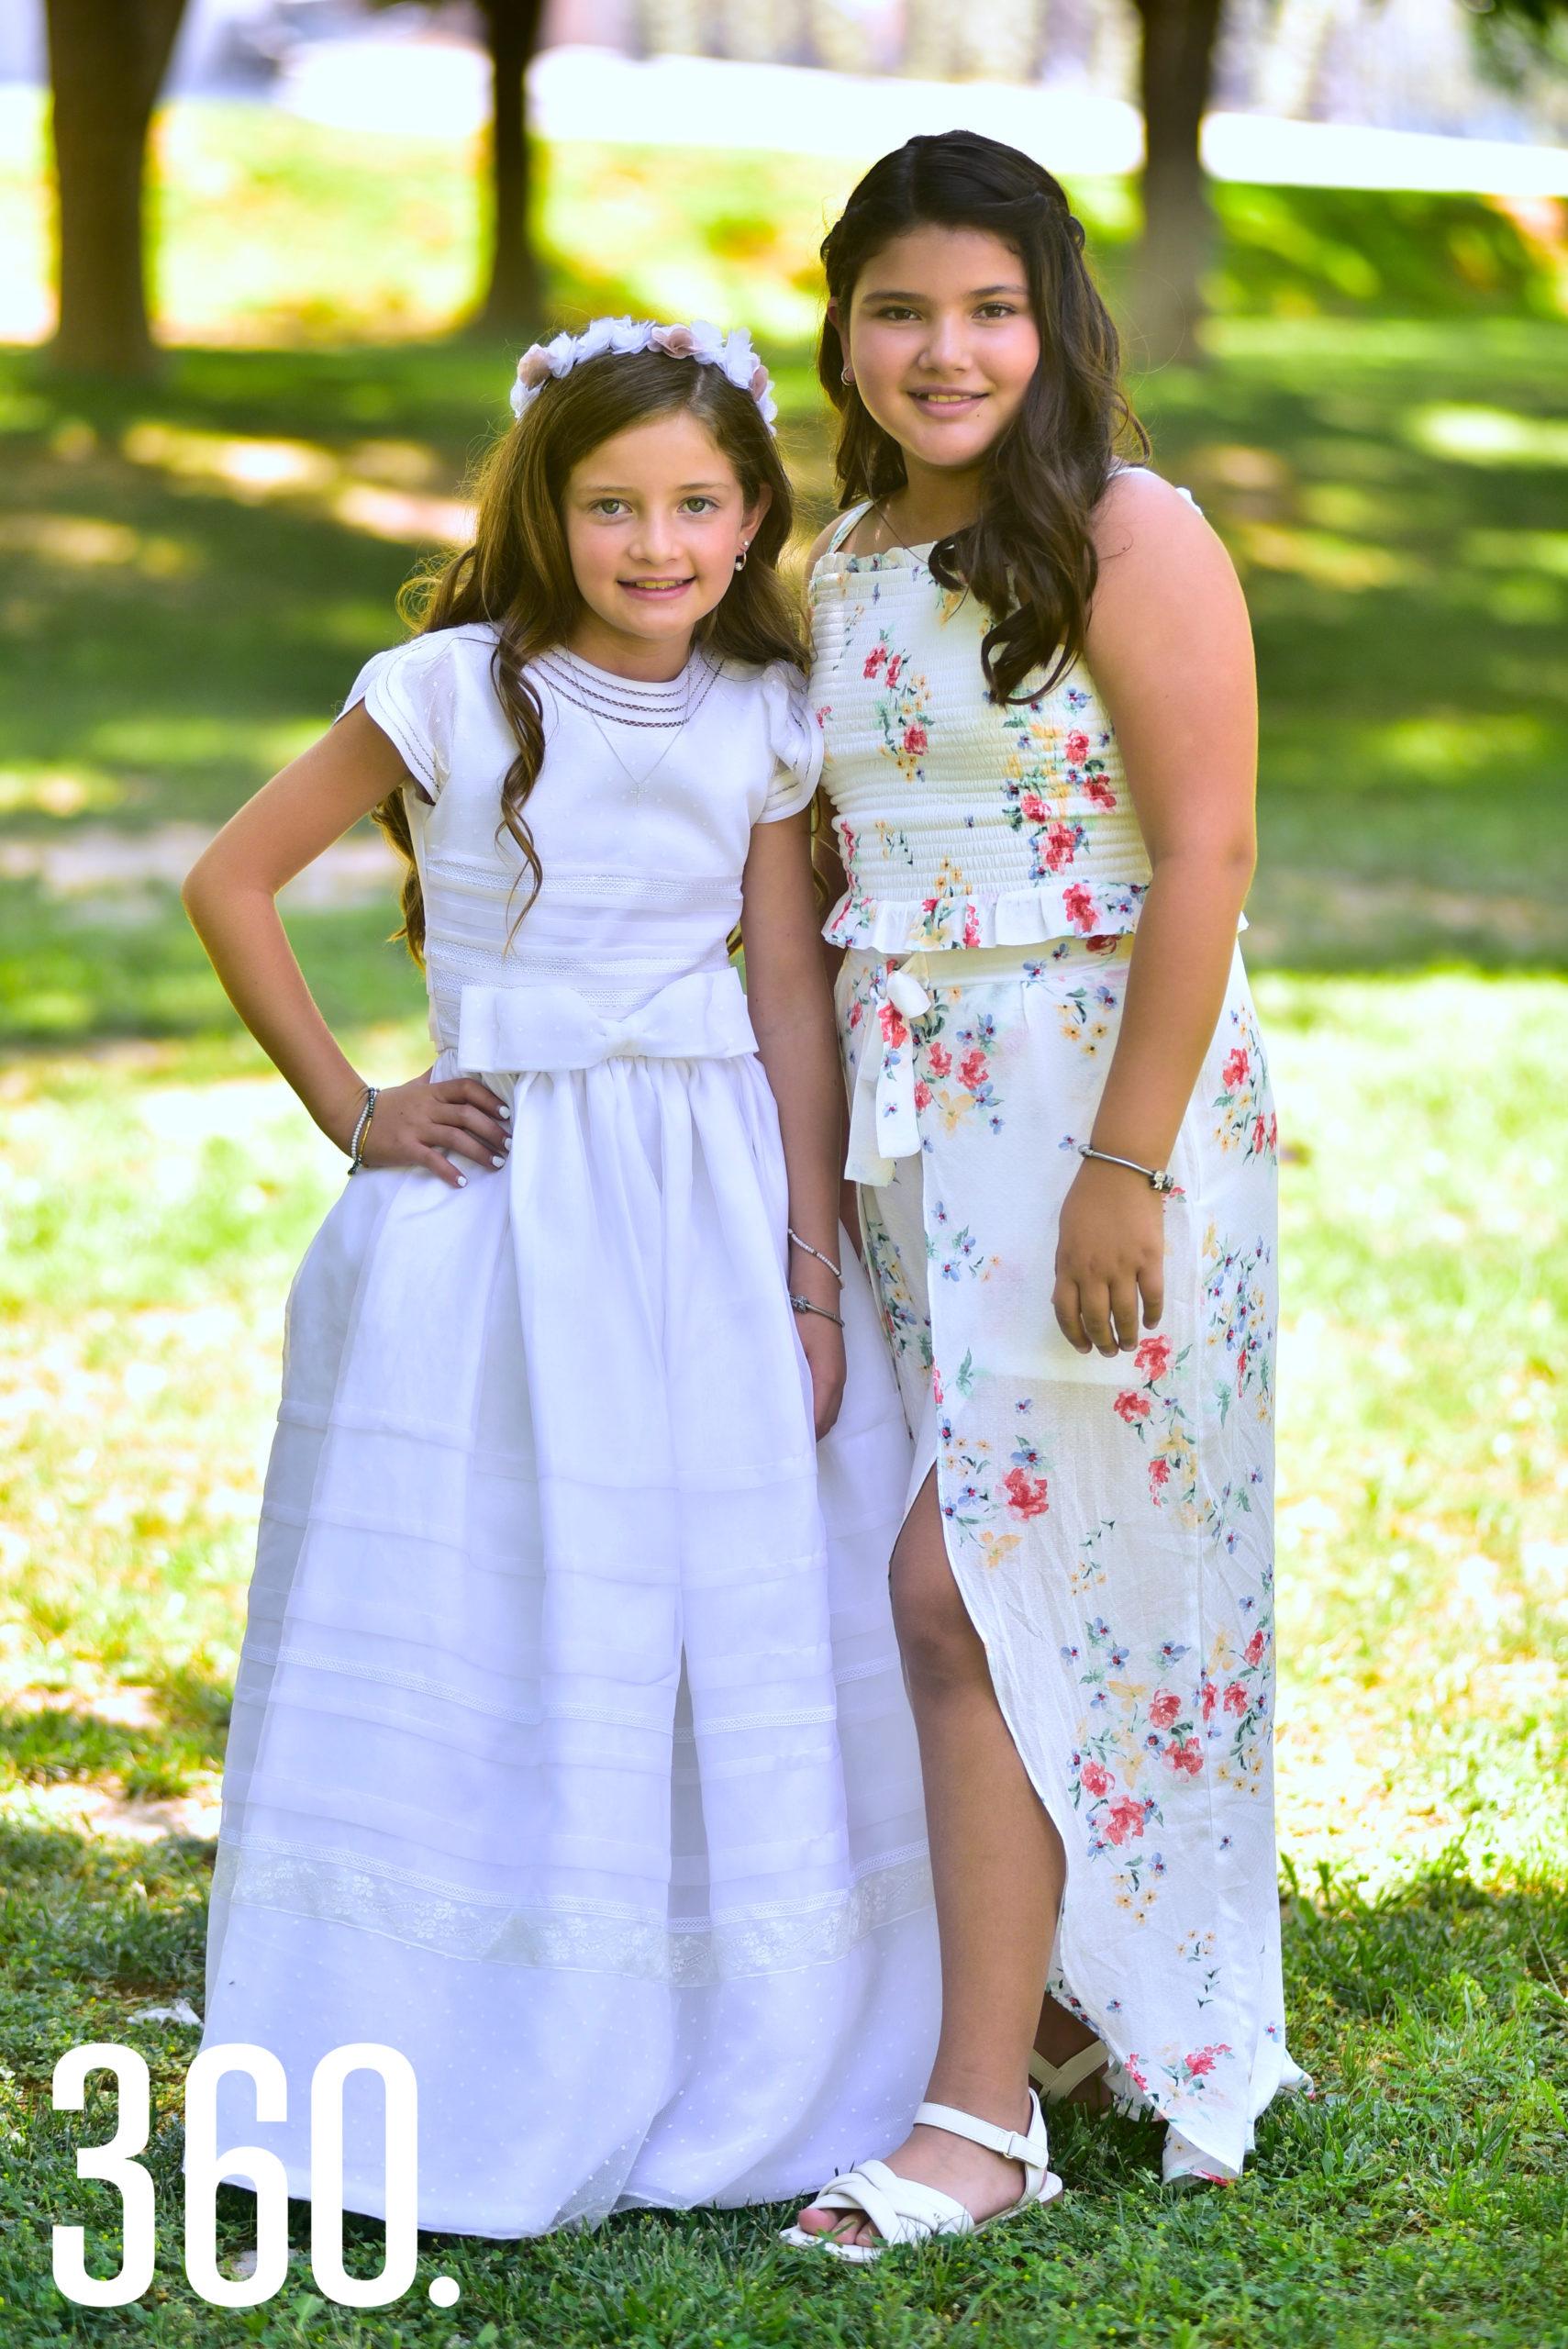 Isabella Gold Rodríguez y su hermana Loretta Gold.